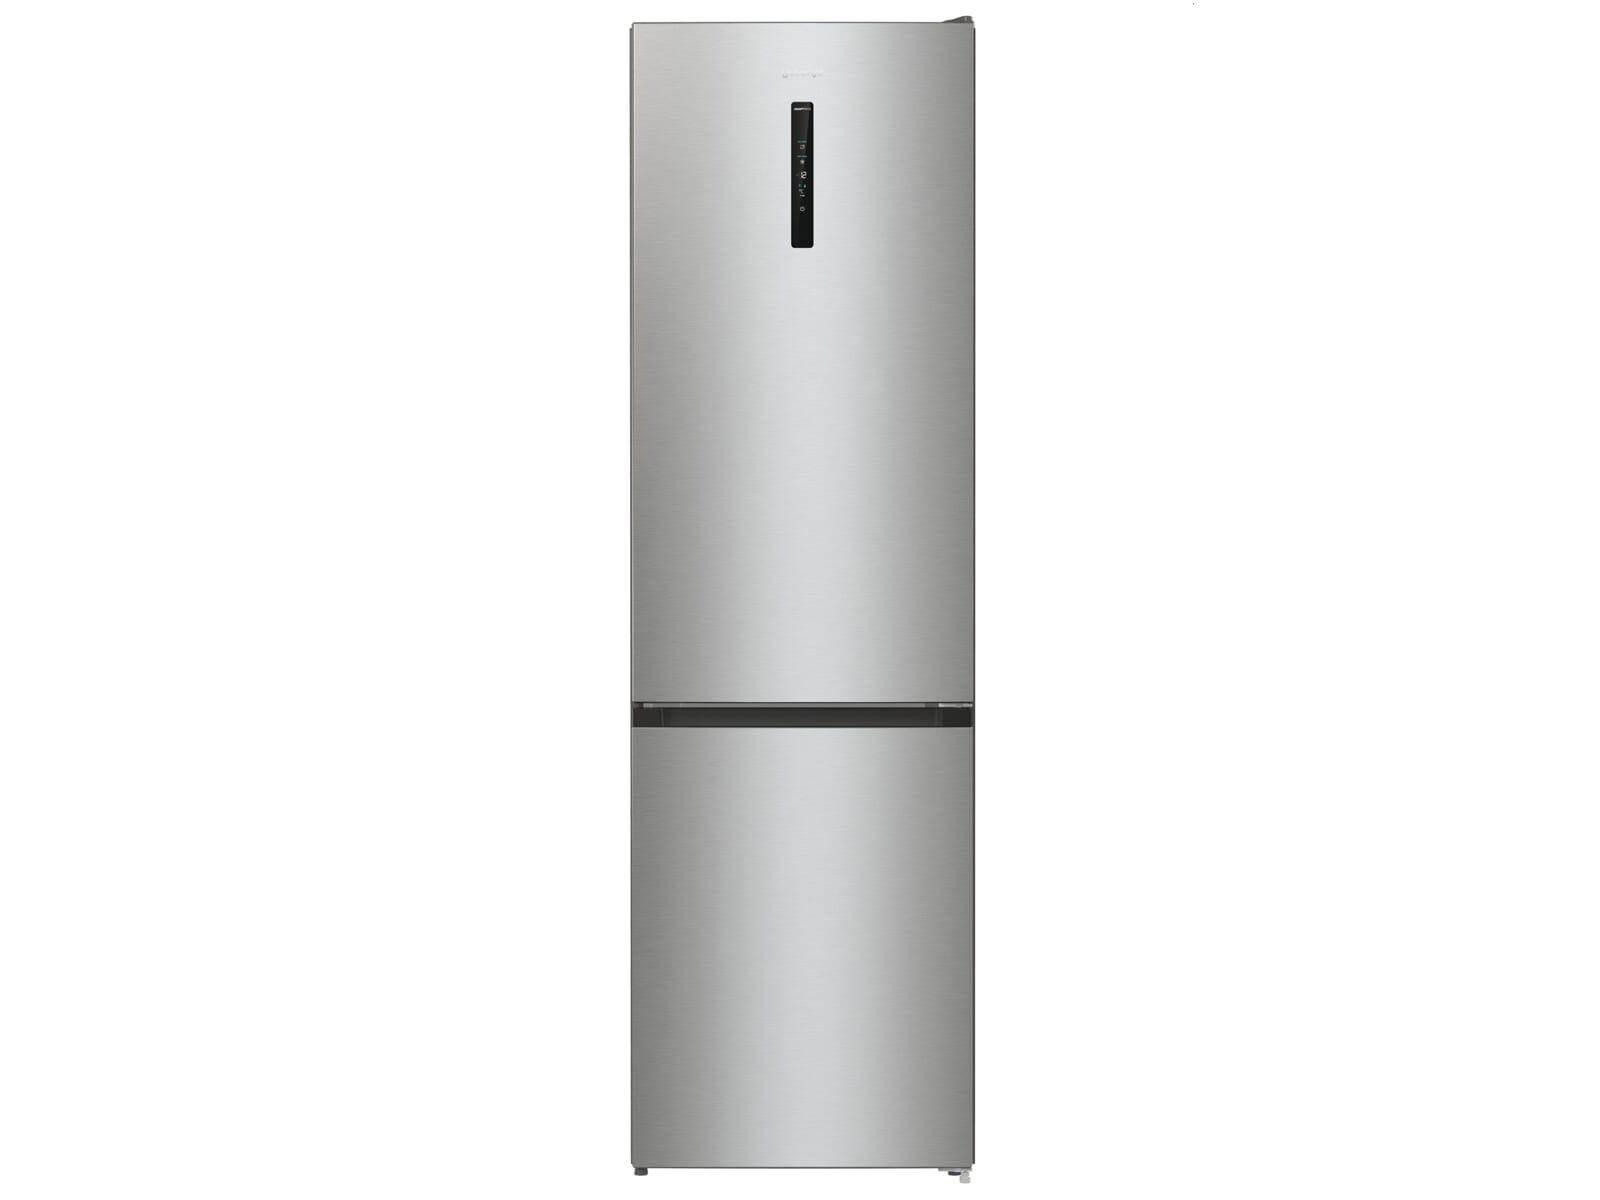 Gorenje NRK 6202 AXL4 Kühl-Gefrier-Kombination Grau Metallic